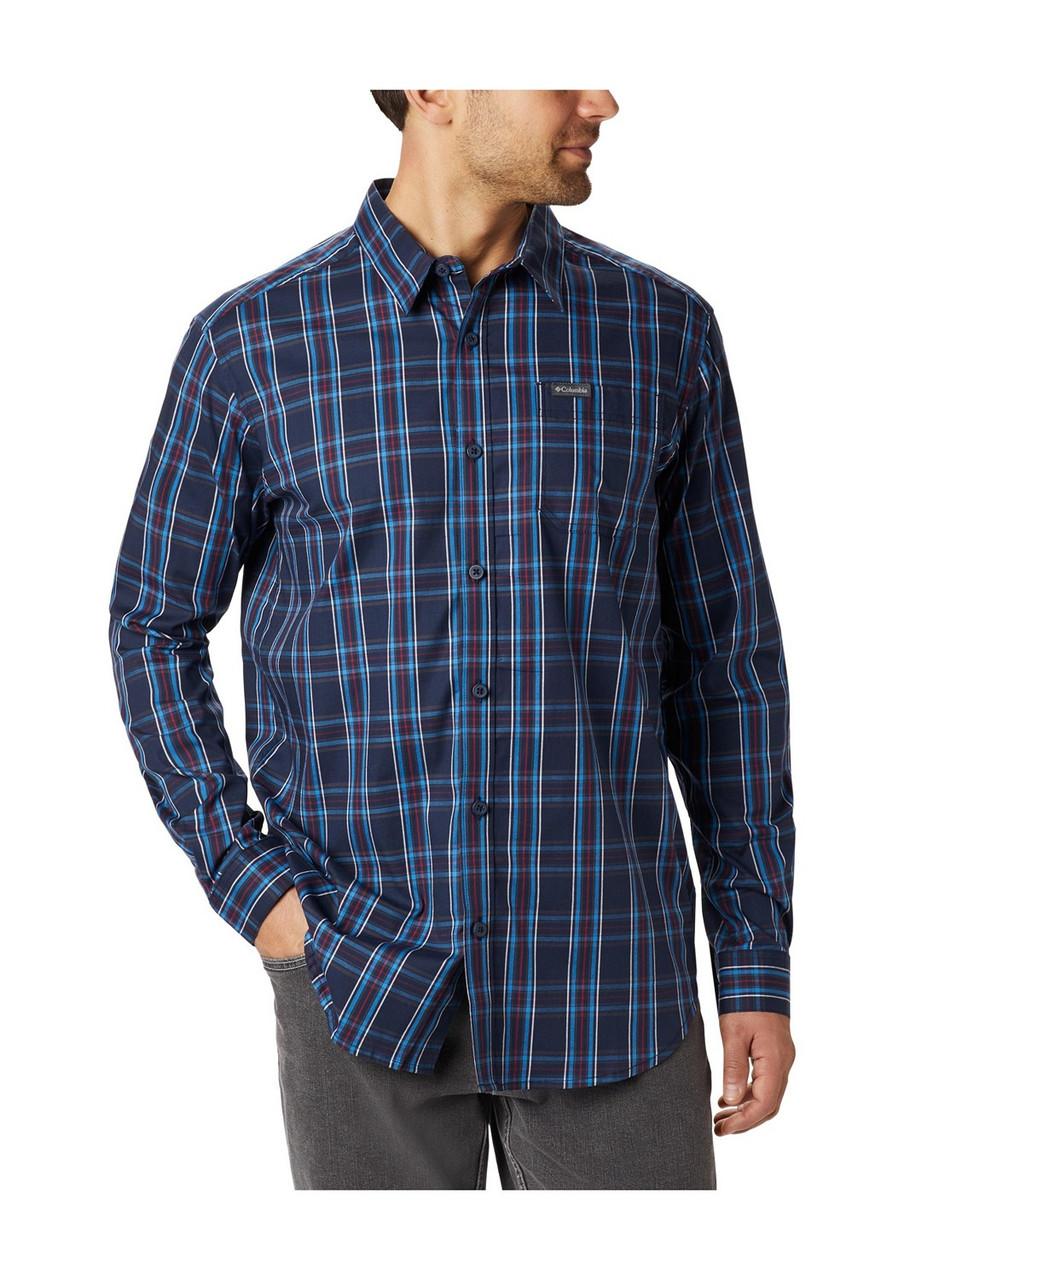 Columbia Мужская рубашка - Е2